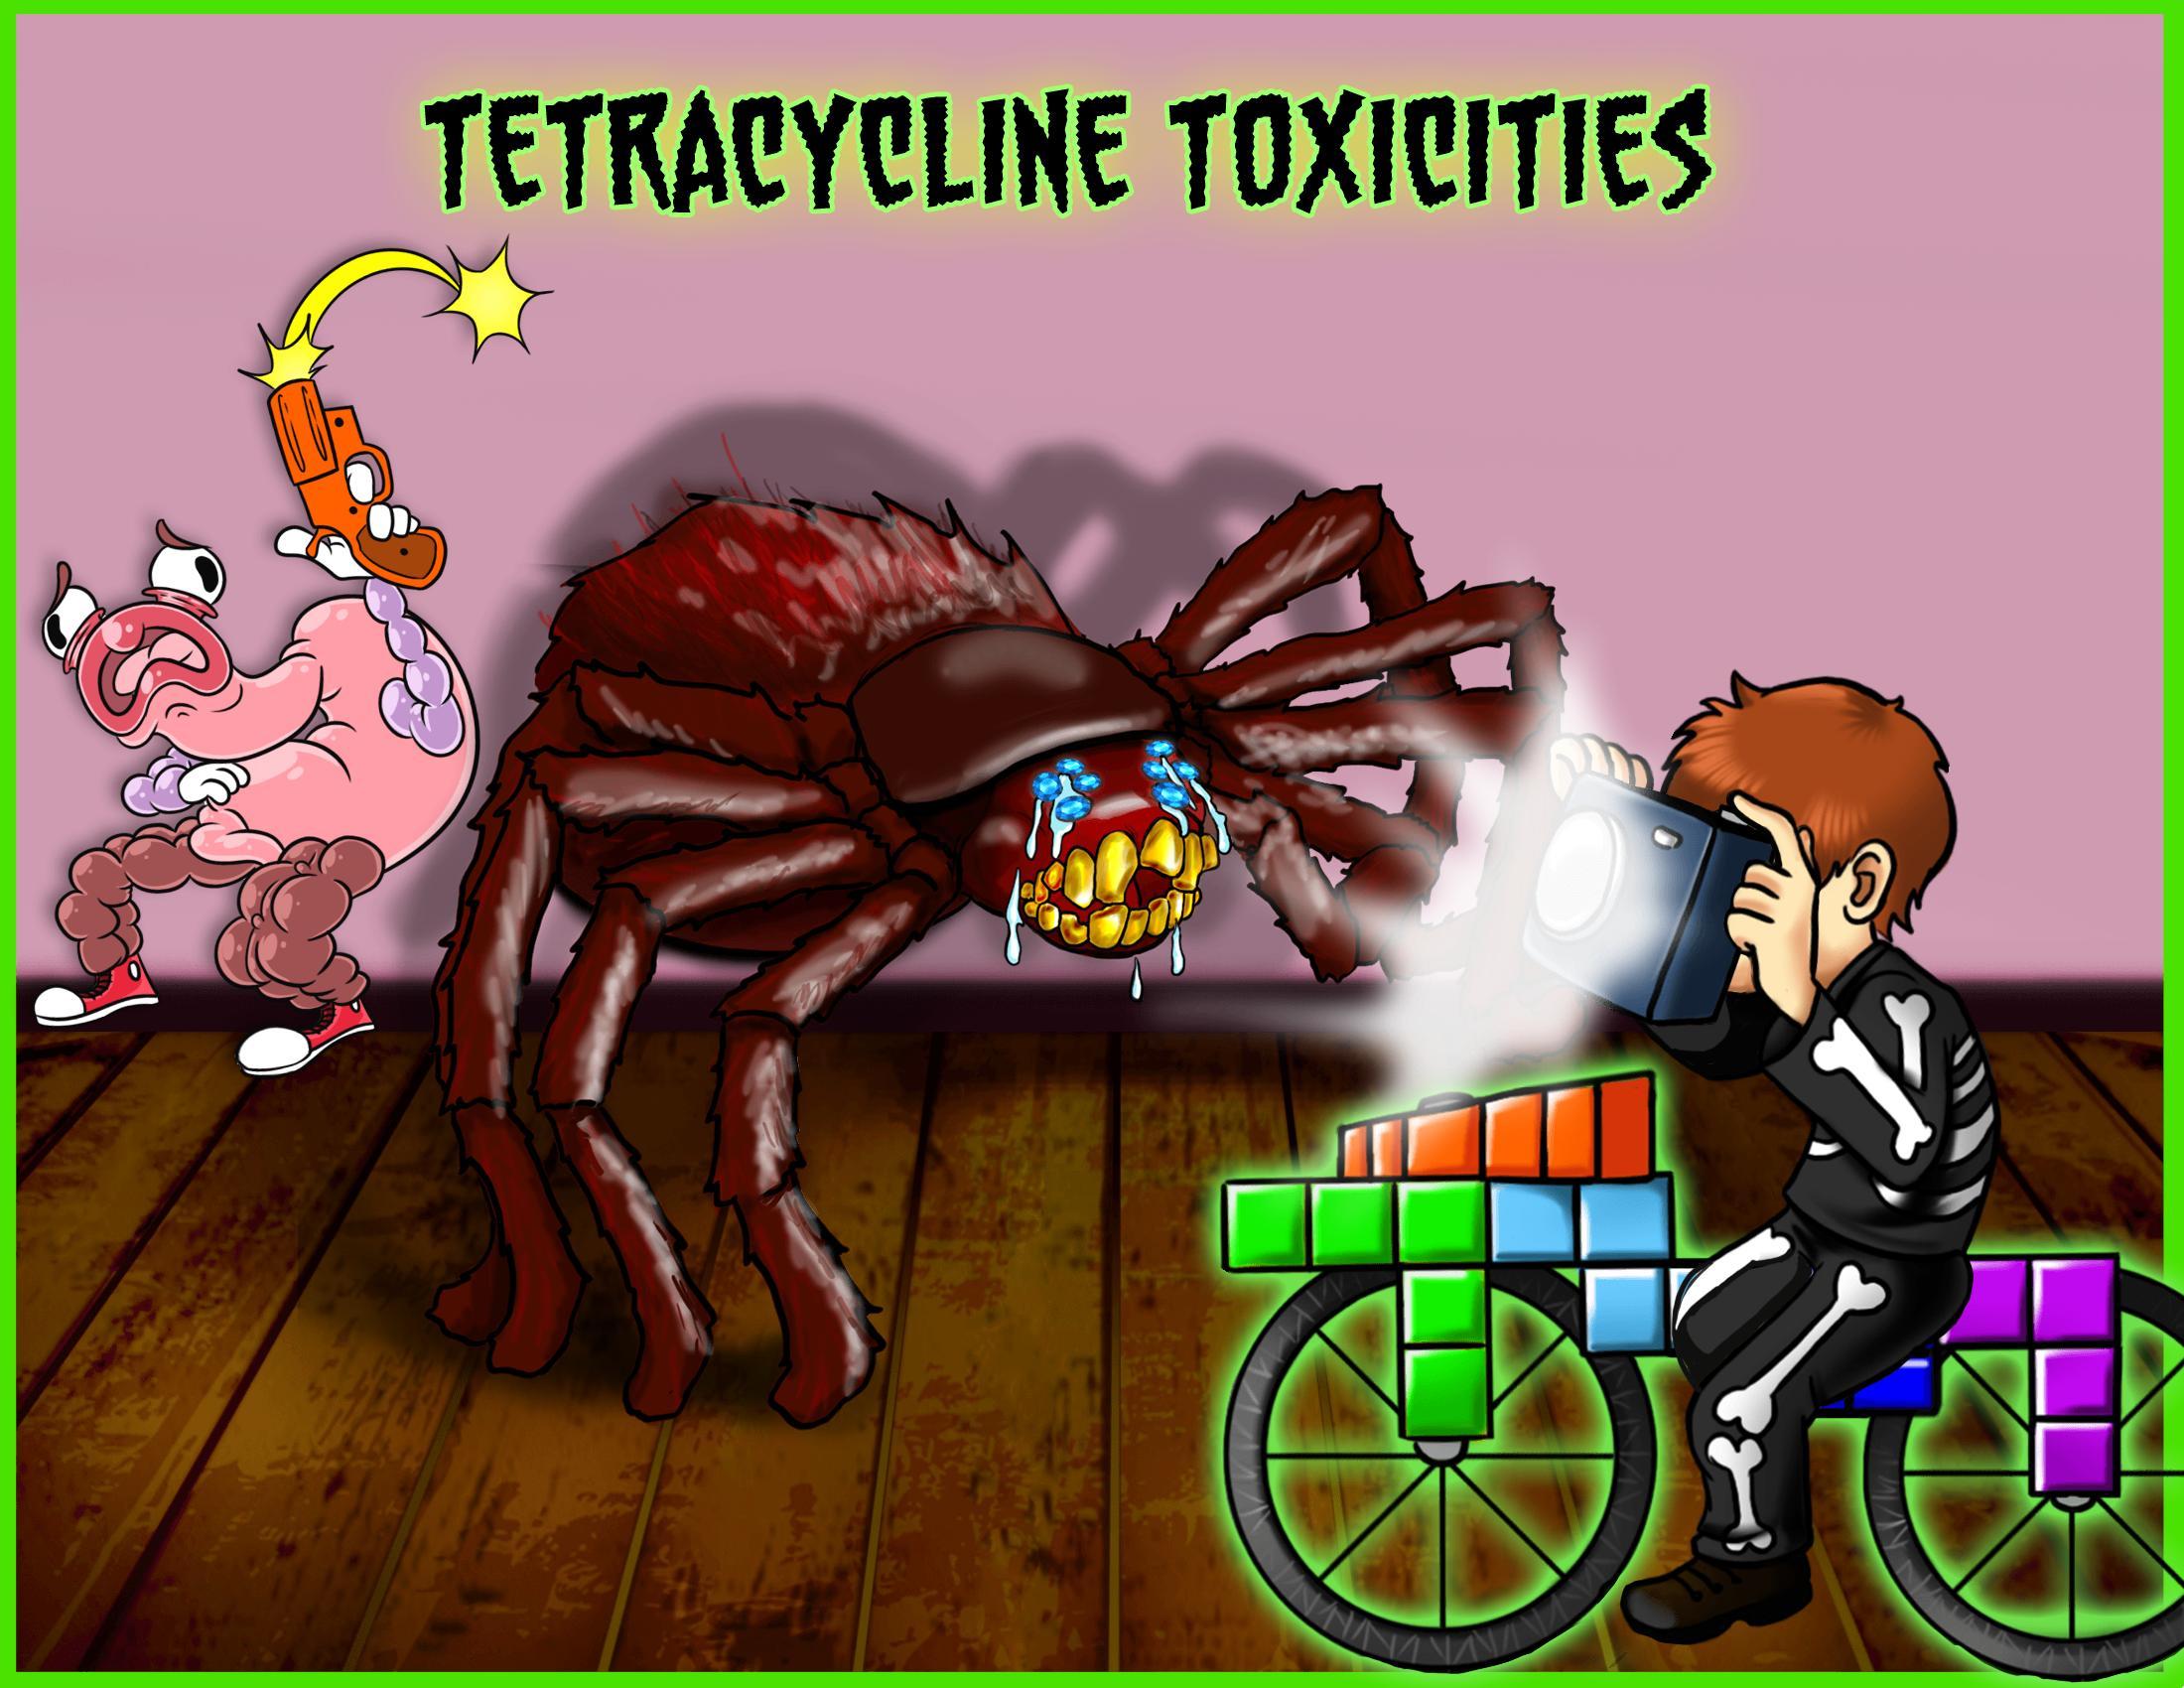 Tetracycline Toxicities